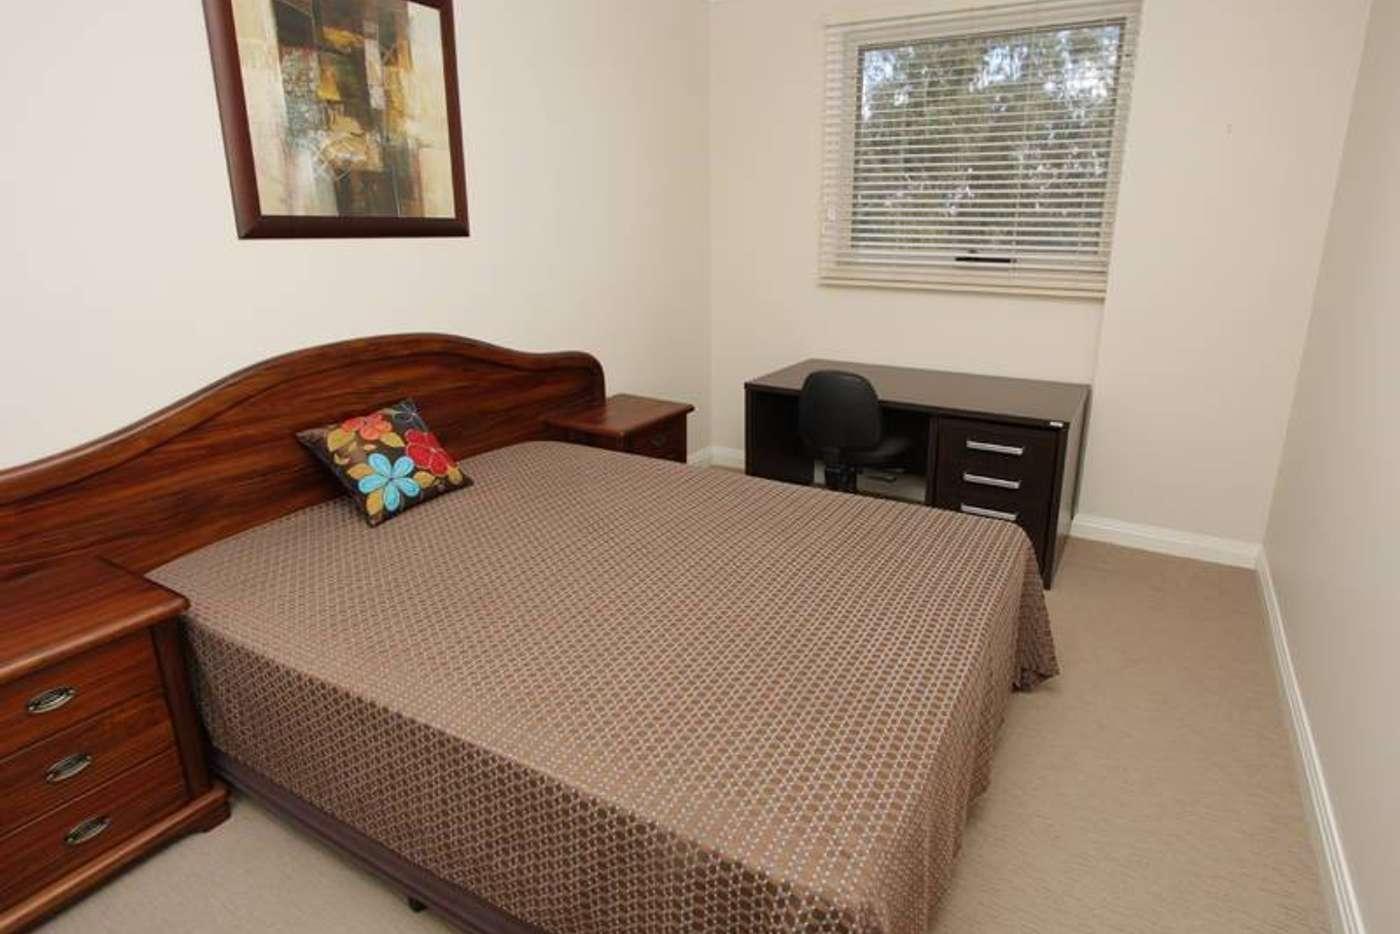 Seventh view of Homely unit listing, 404/138 Tarcutta Street, Wagga Wagga NSW 2650